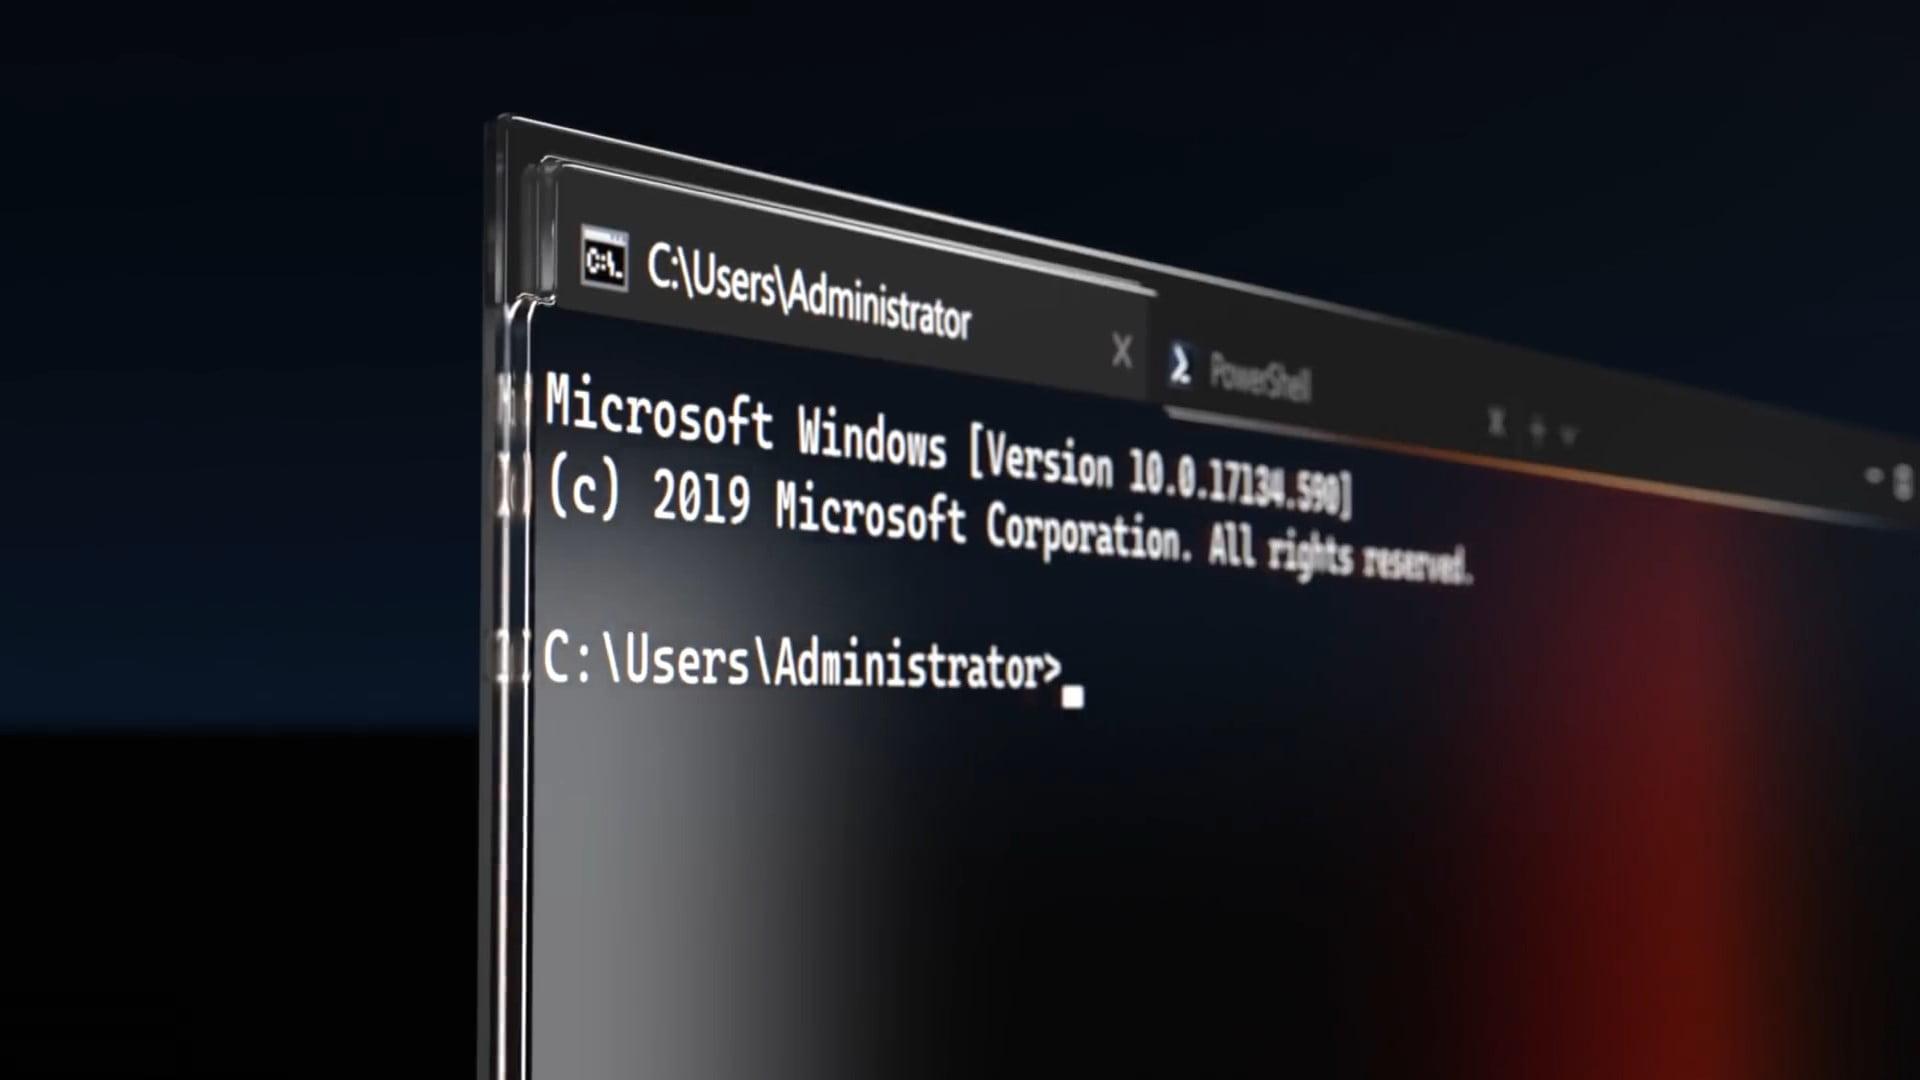 The Windows Terminal already has a brand new icon